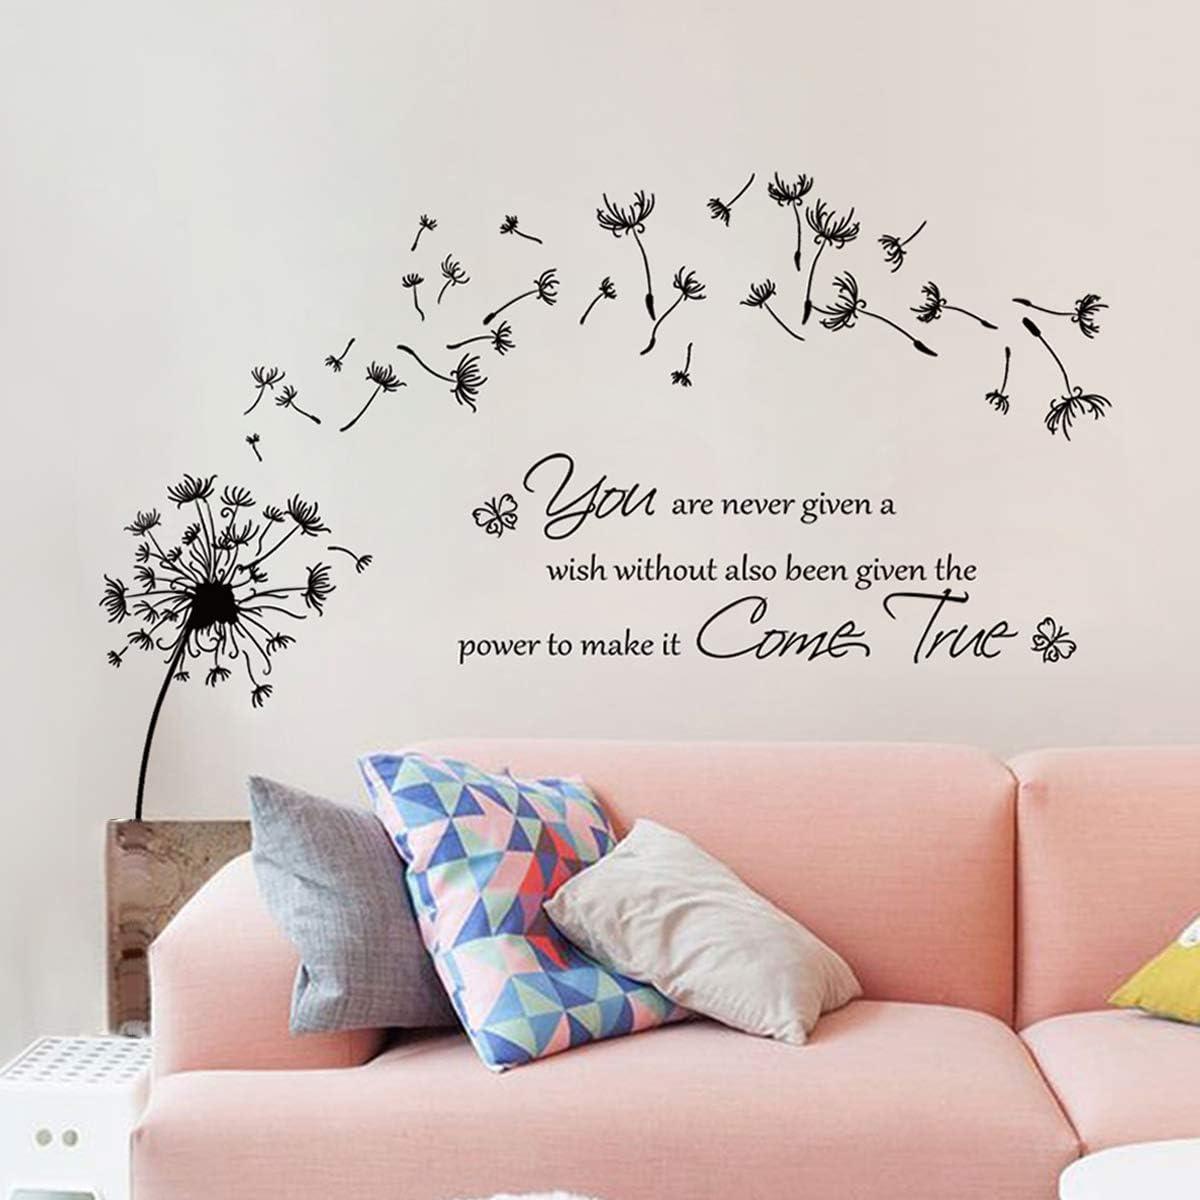 Decalmile Dandelion Wall Sticker Sayings And Quotes Dandelion Wall Sticker Bedroom Office Living Room Wall Decoration Amazon De Kuche Haushalt